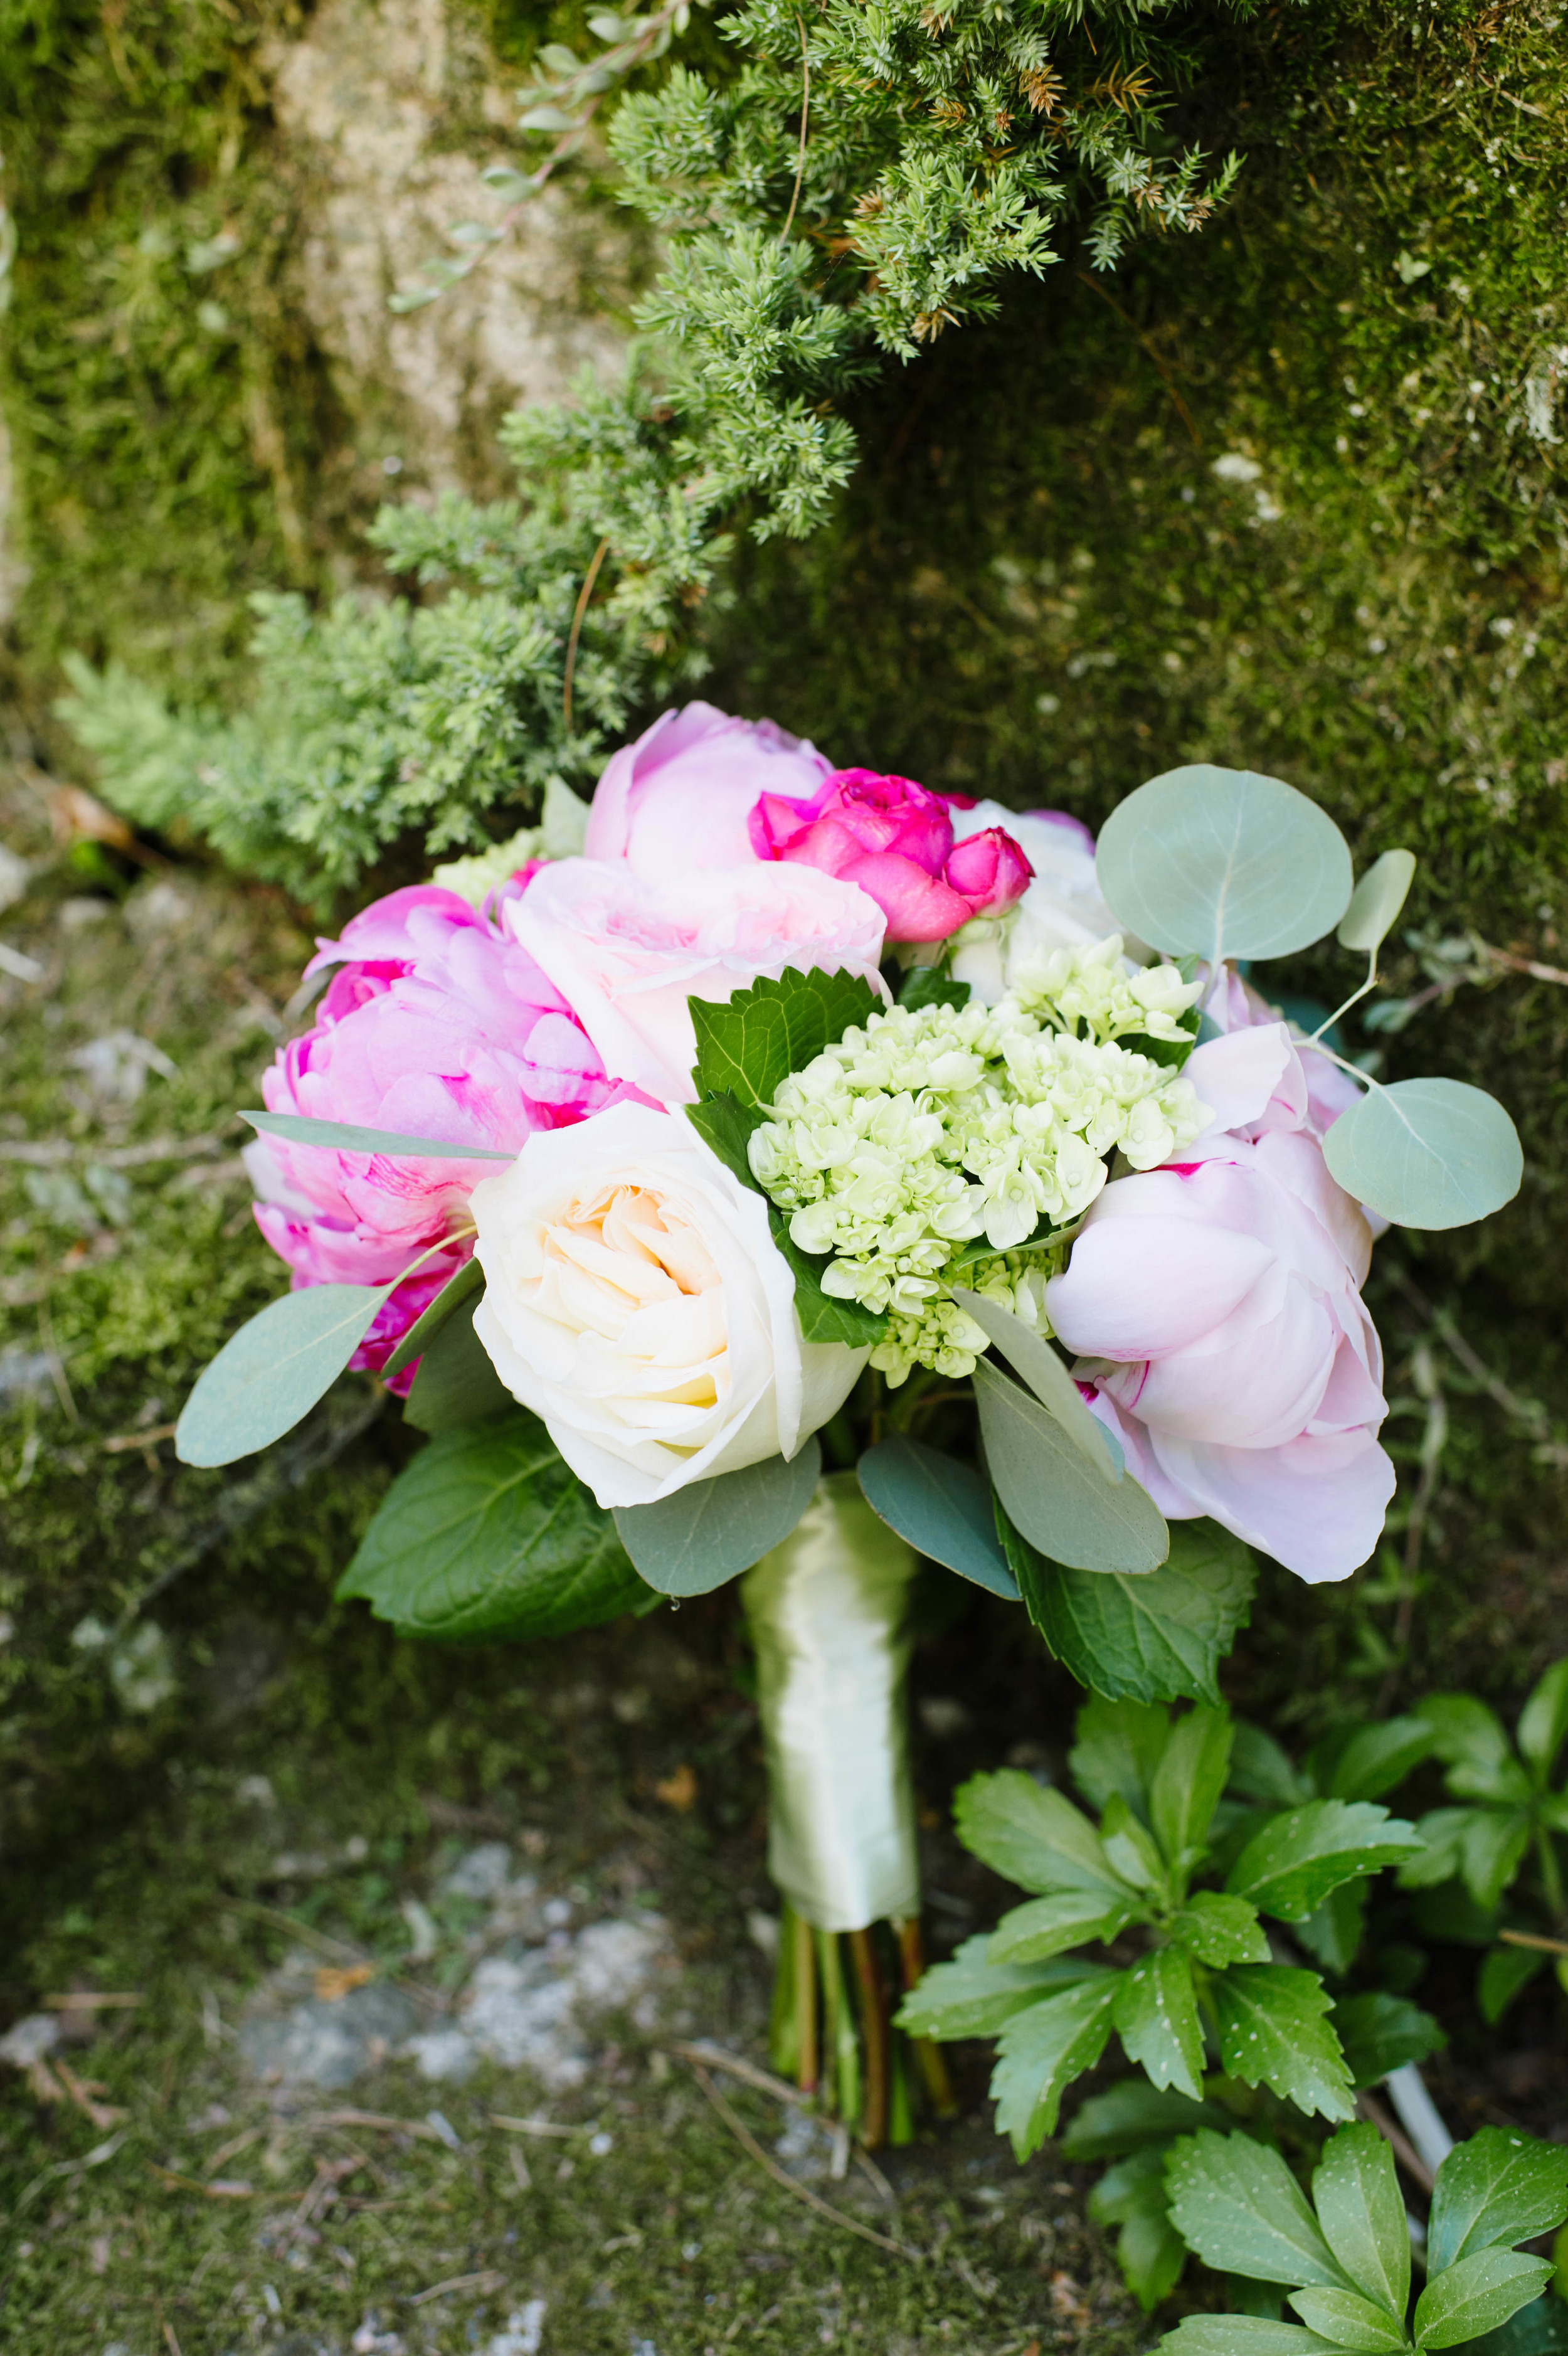 Candid_Wedding_Photography003.jpg